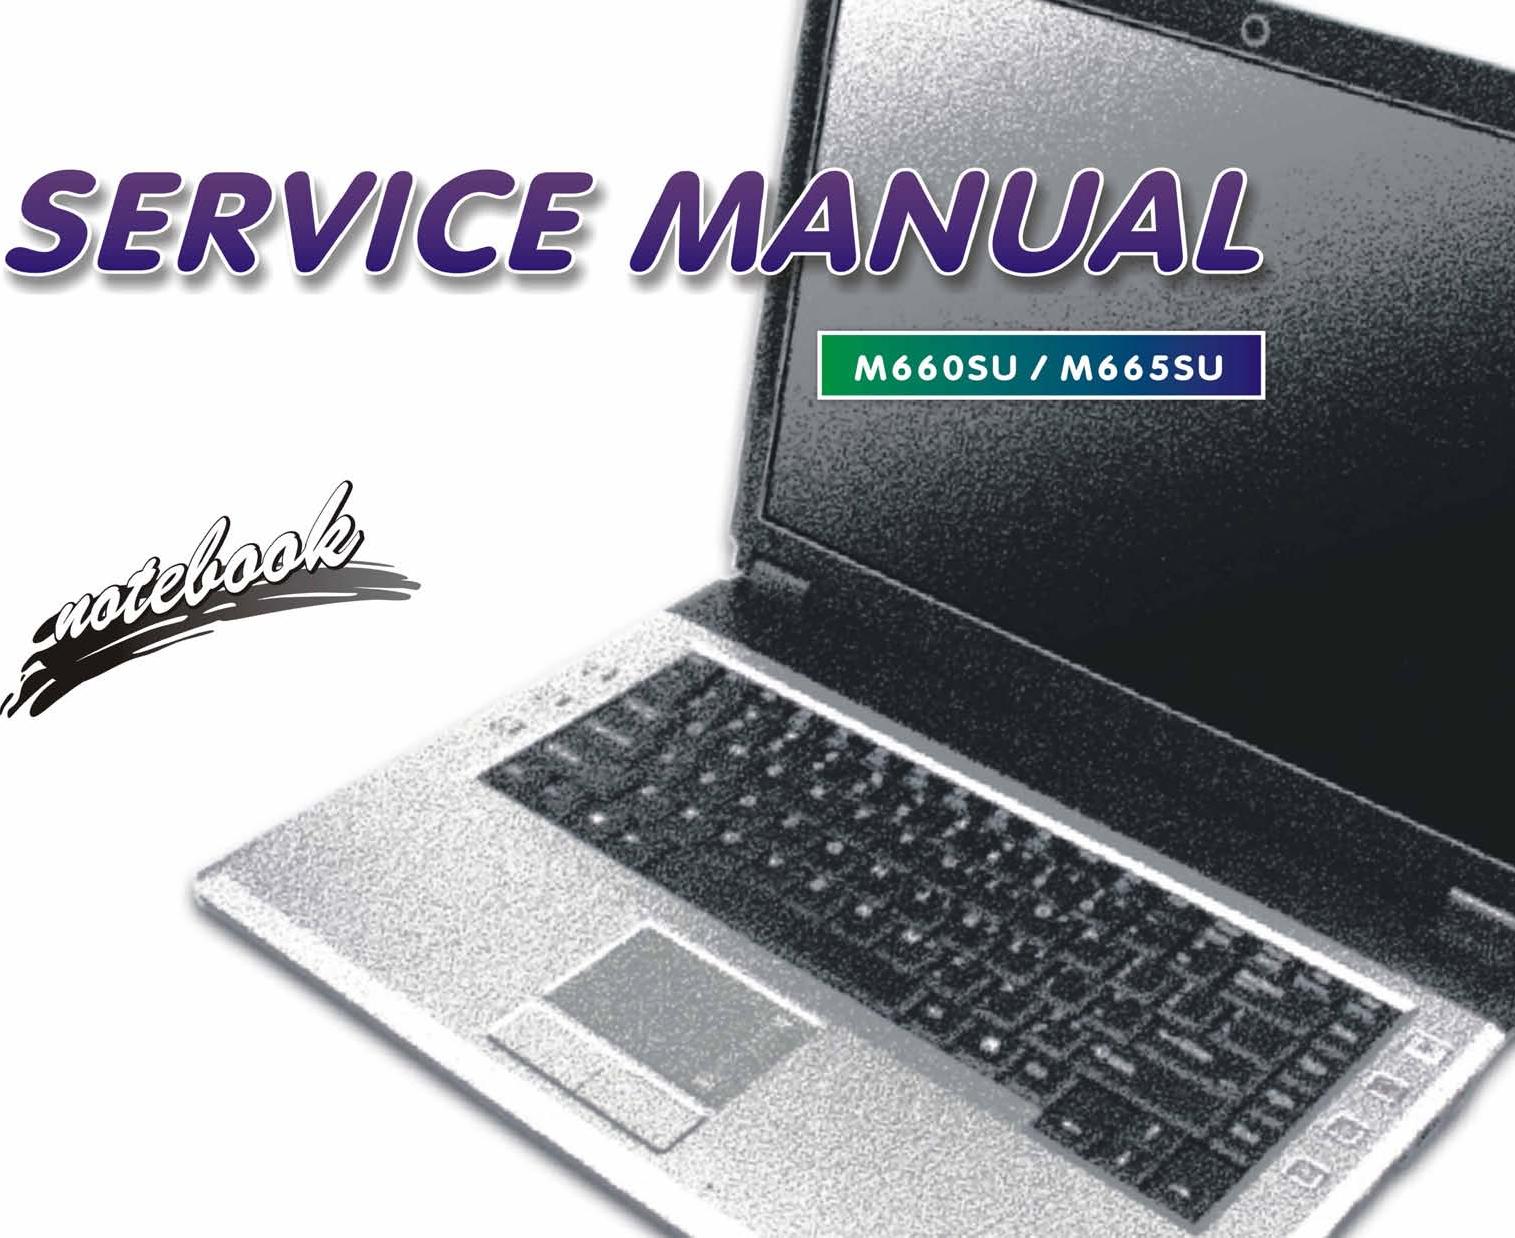 Clevo M660SU, M665SU Service Manual  Www s manuals com  Manual